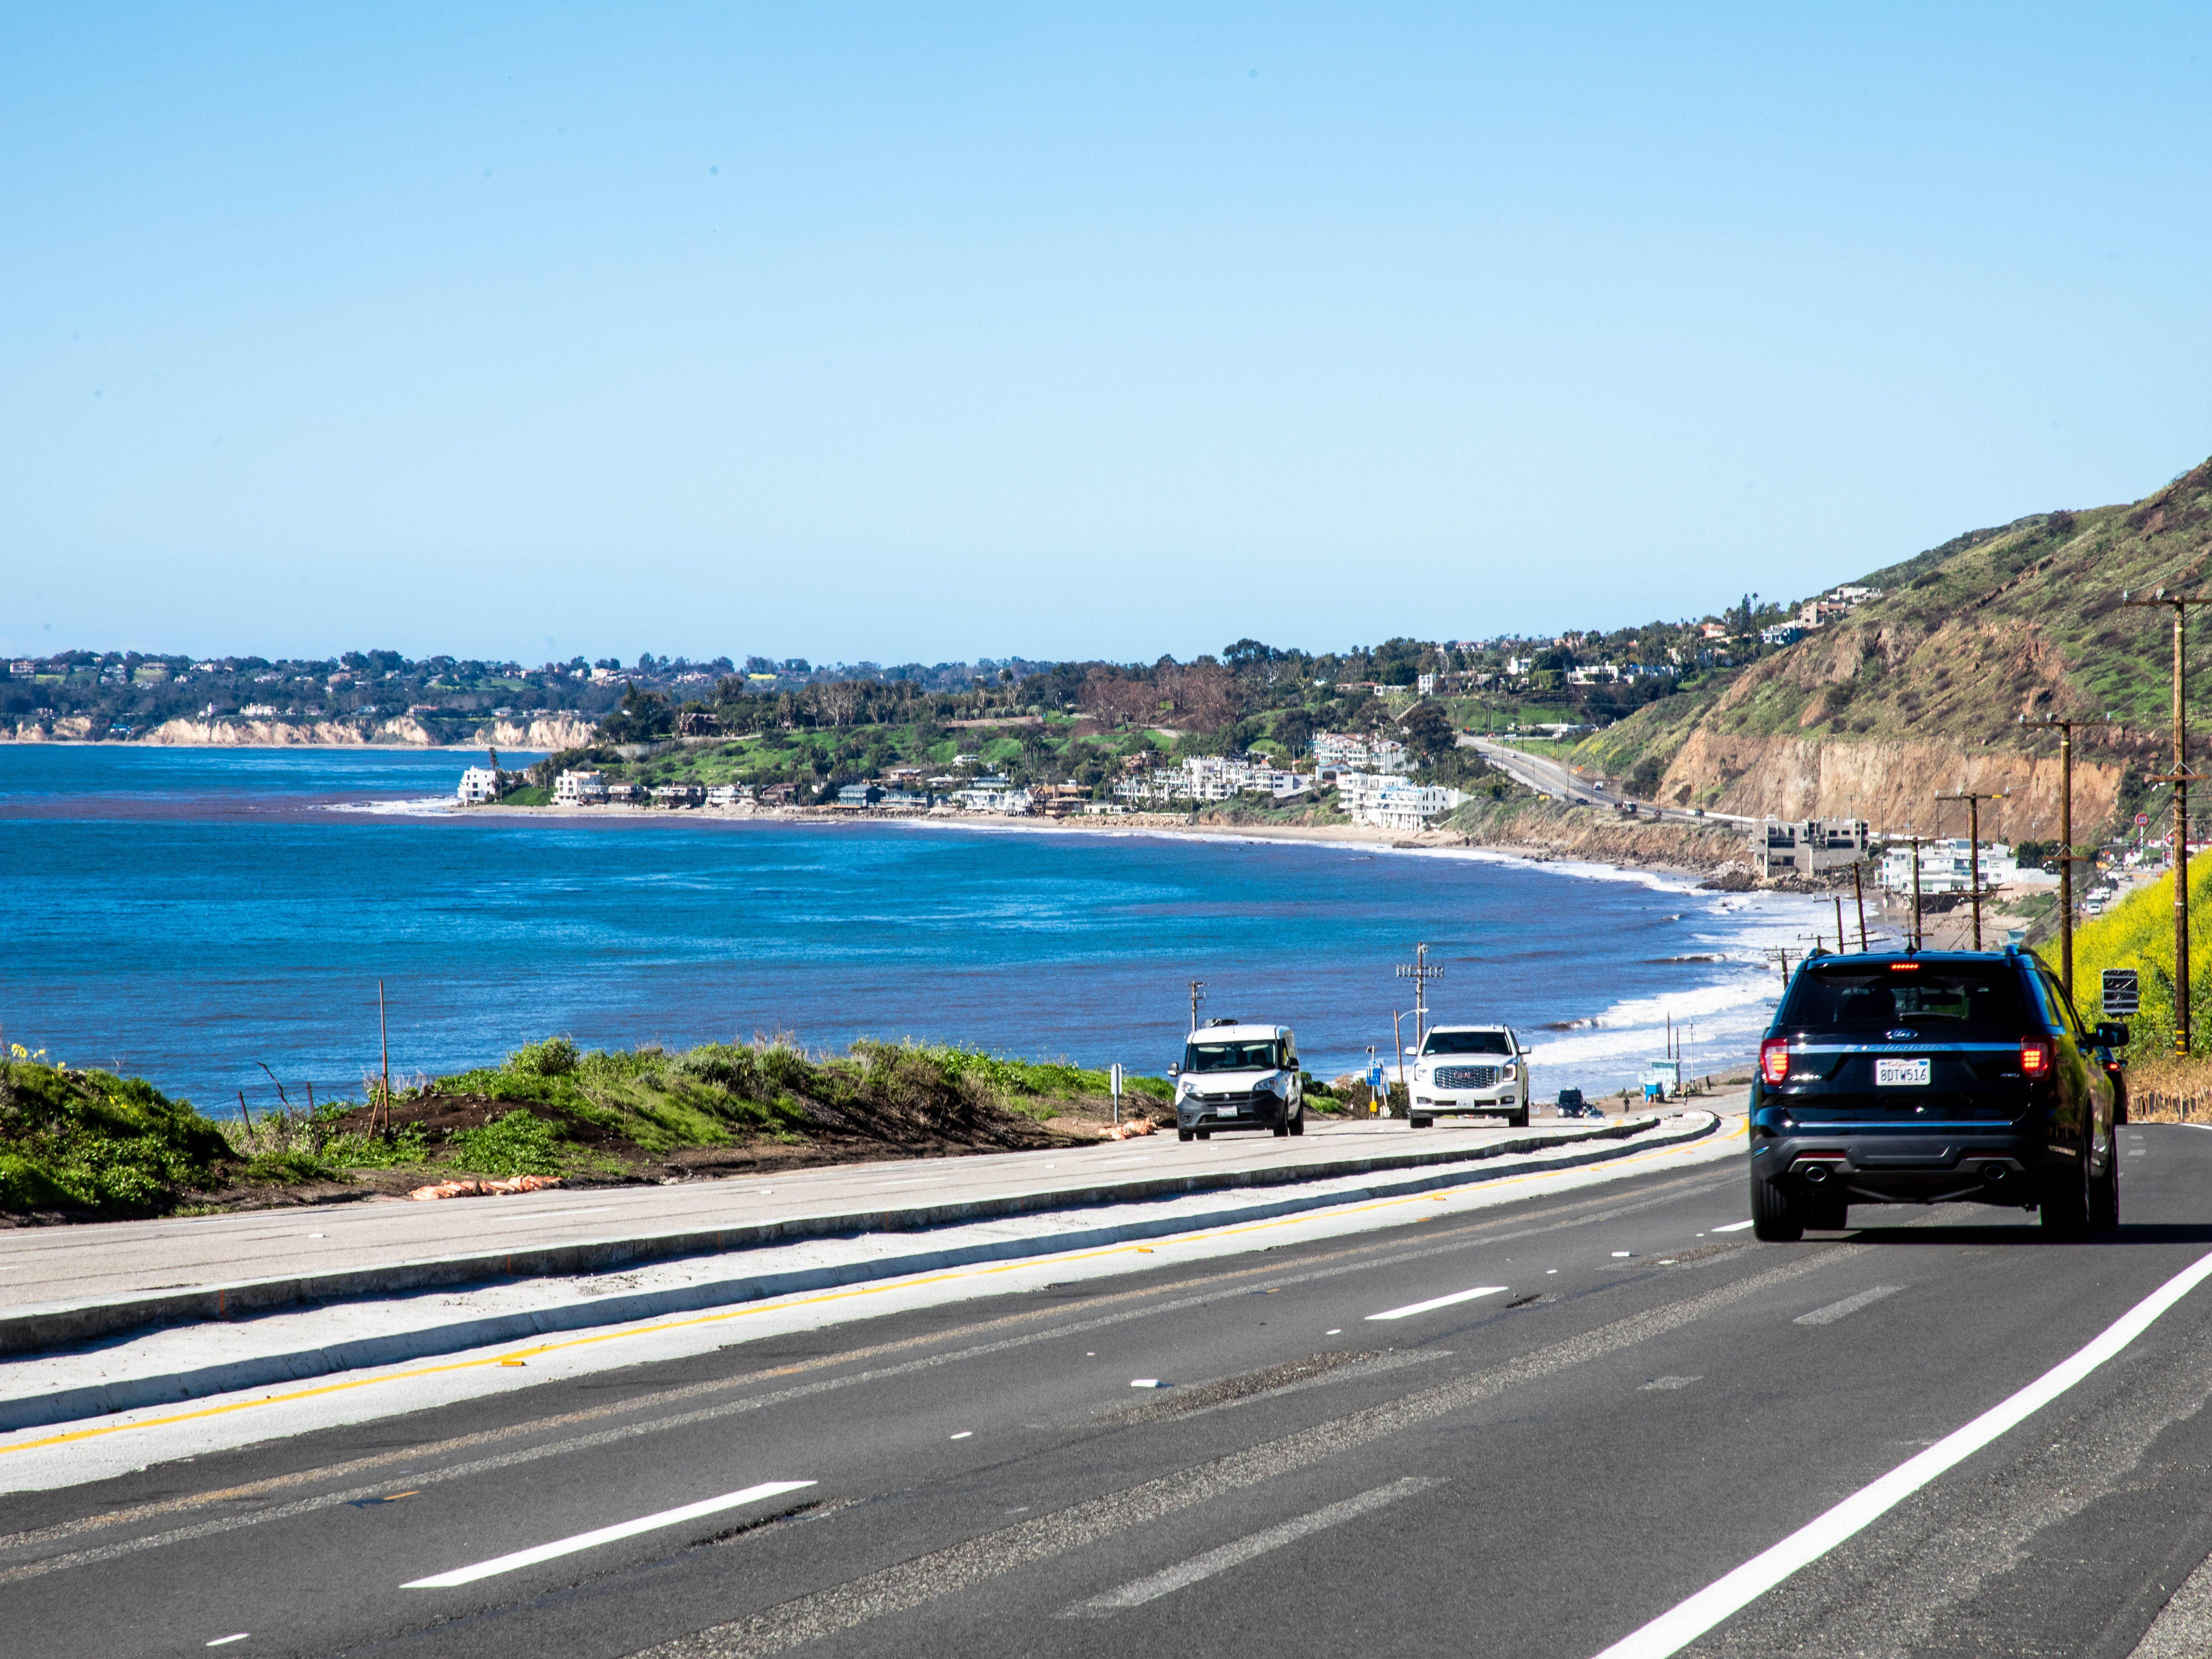 Driving the Pacific Coast Highway in Malibu, California